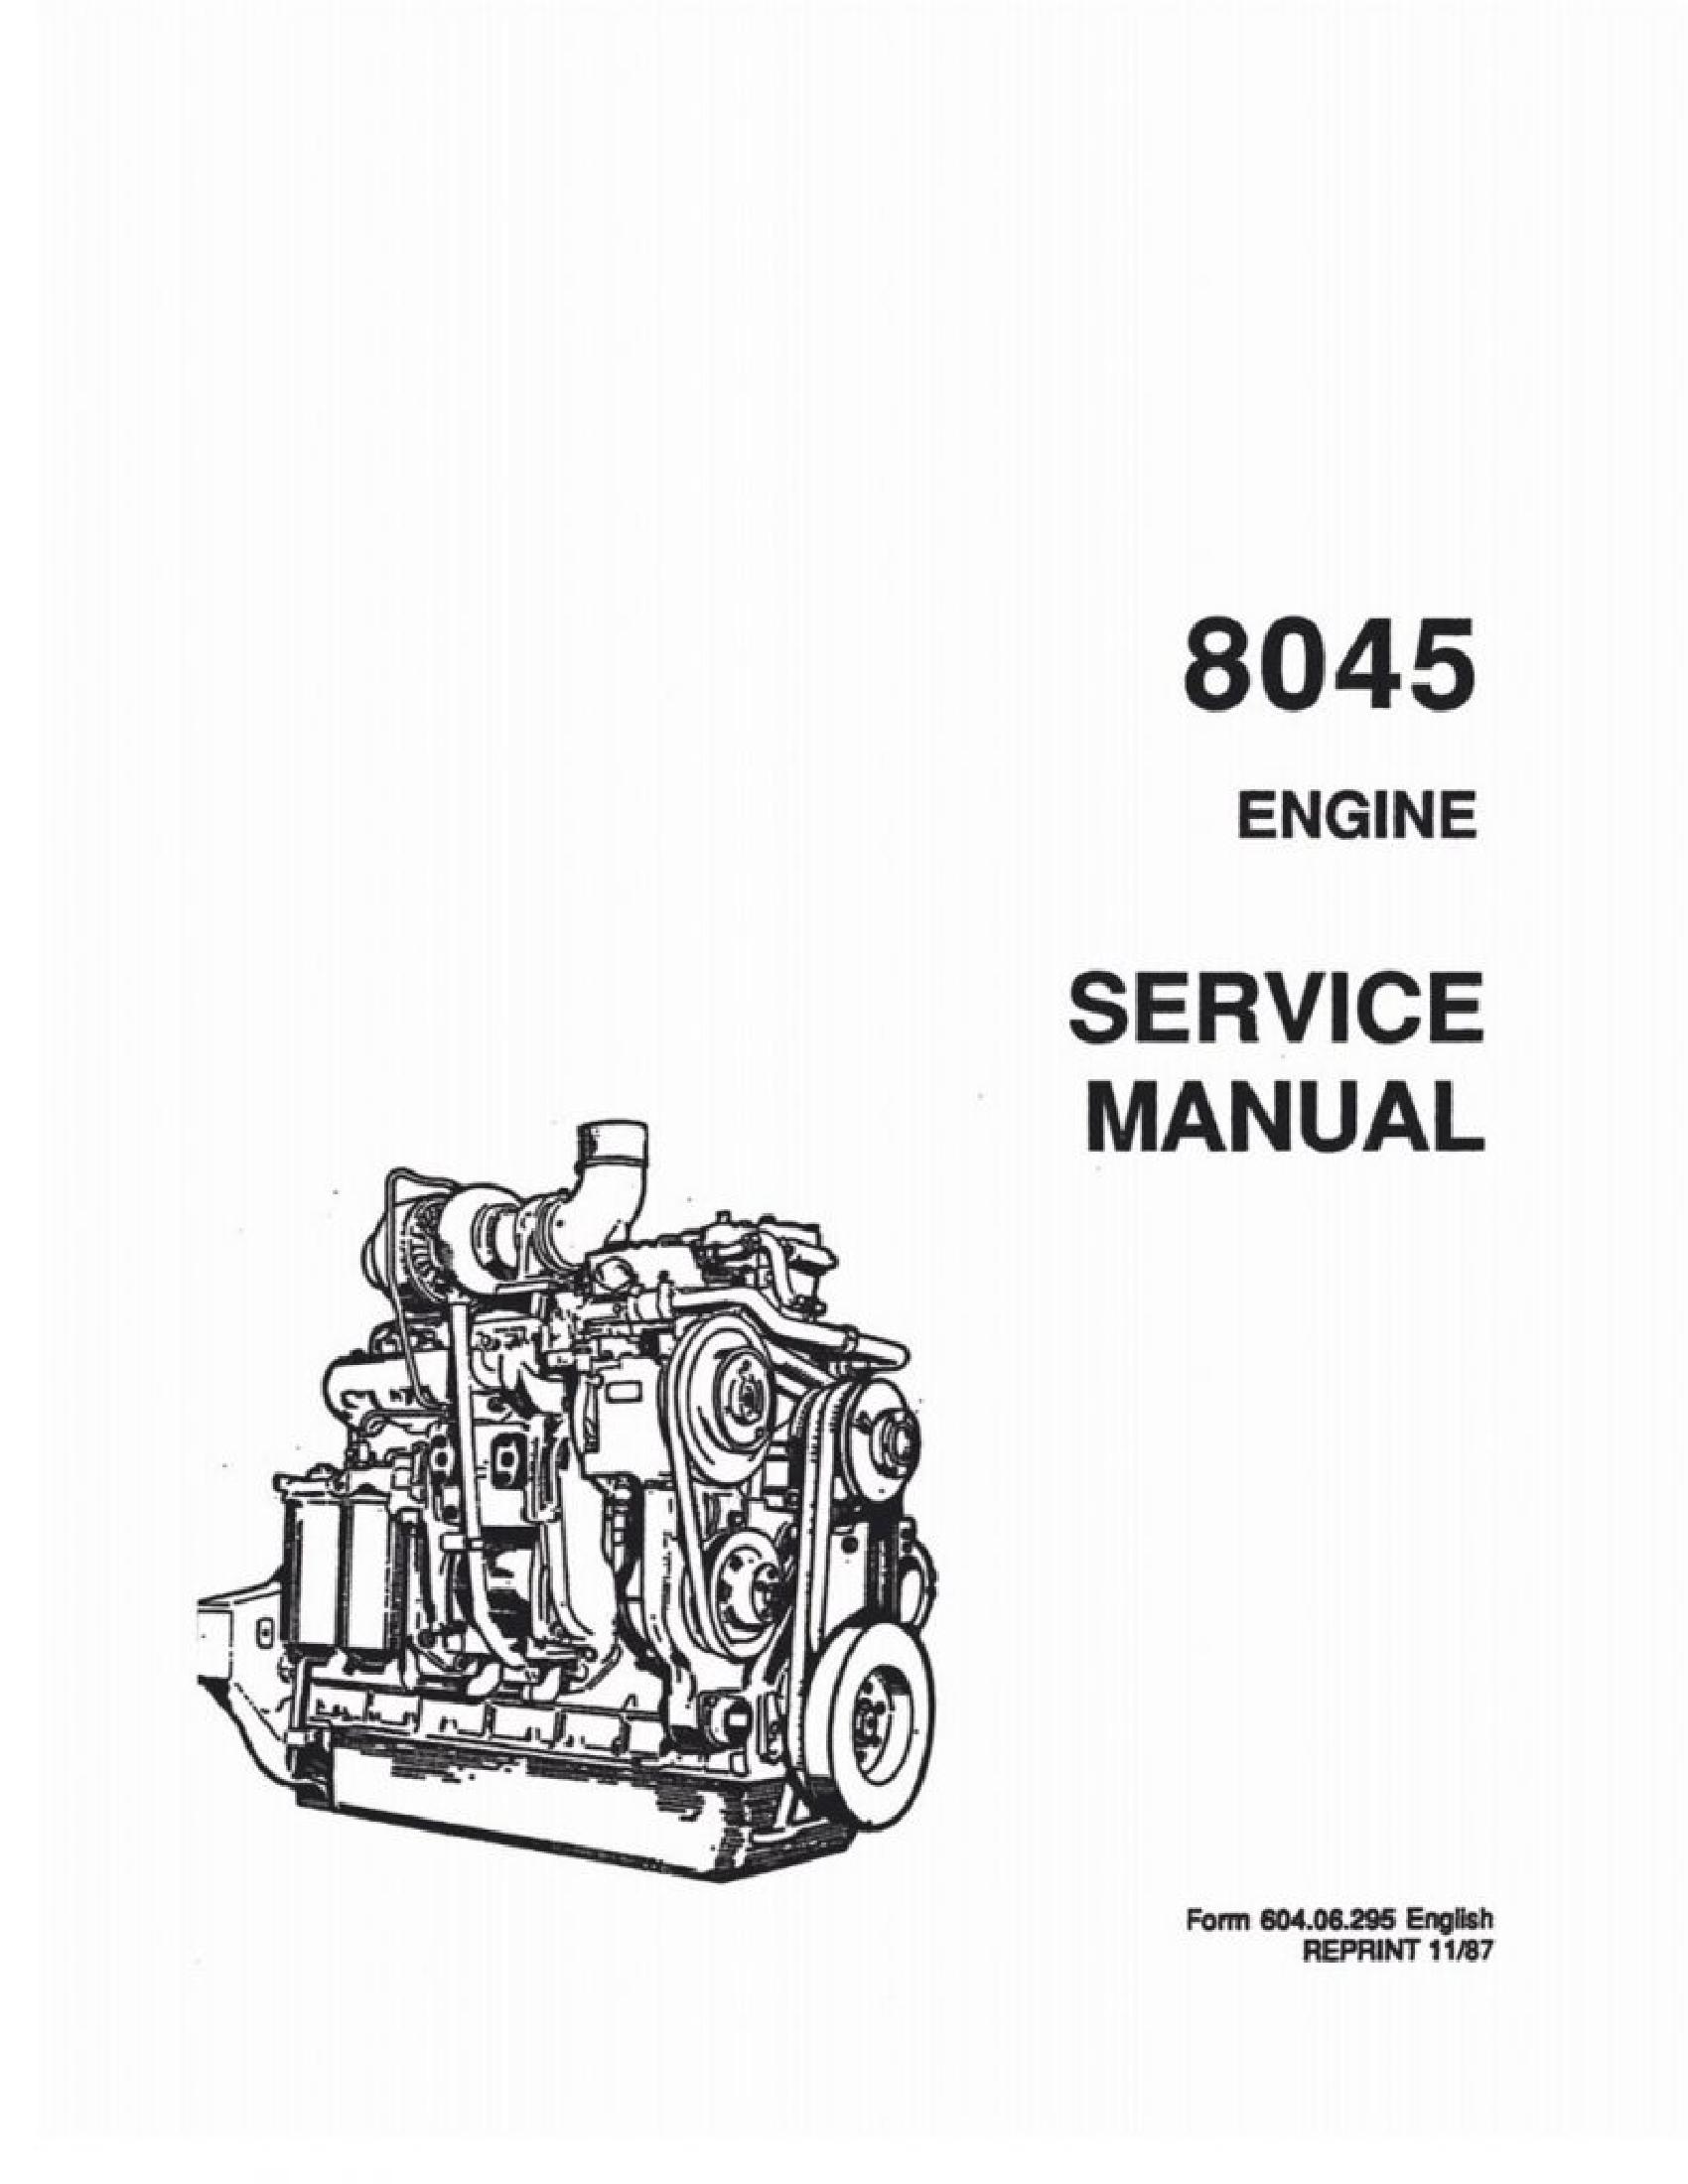 Fiat-Allis 8045 Engine manual